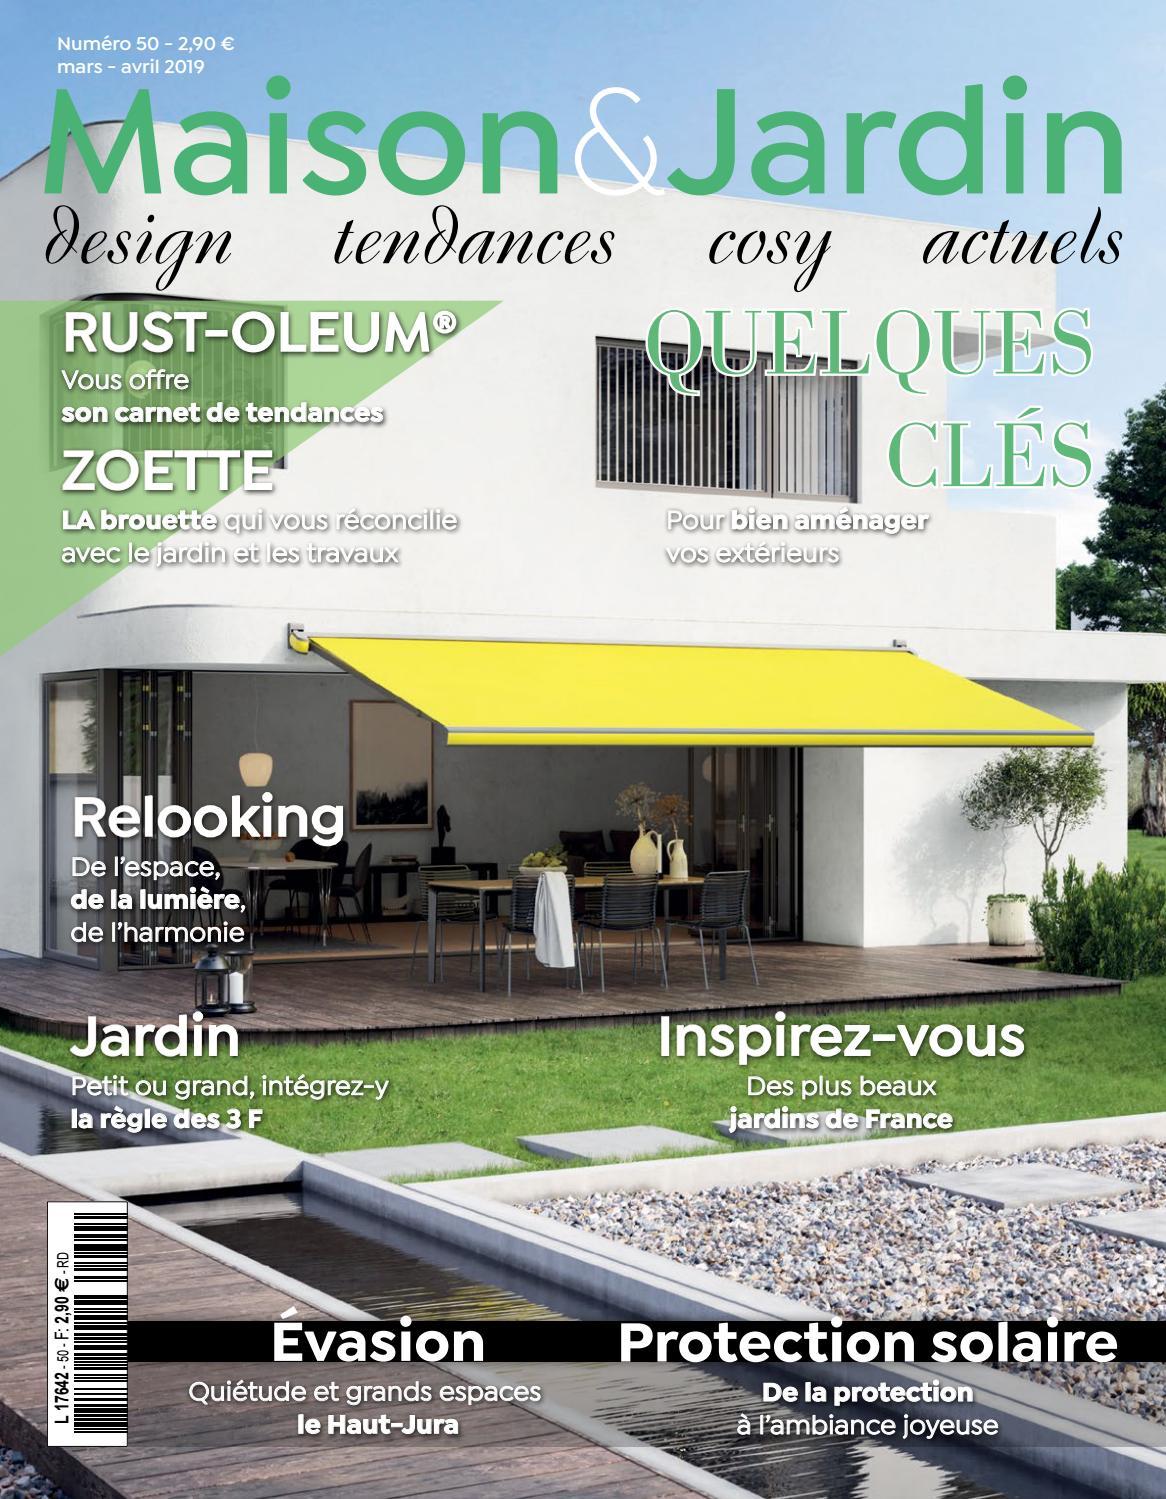 Maison Et Jardin Mars Avril 2019 By Spmediacom - Issuu avec Serre De Jardin Occasion Le Bon Coin